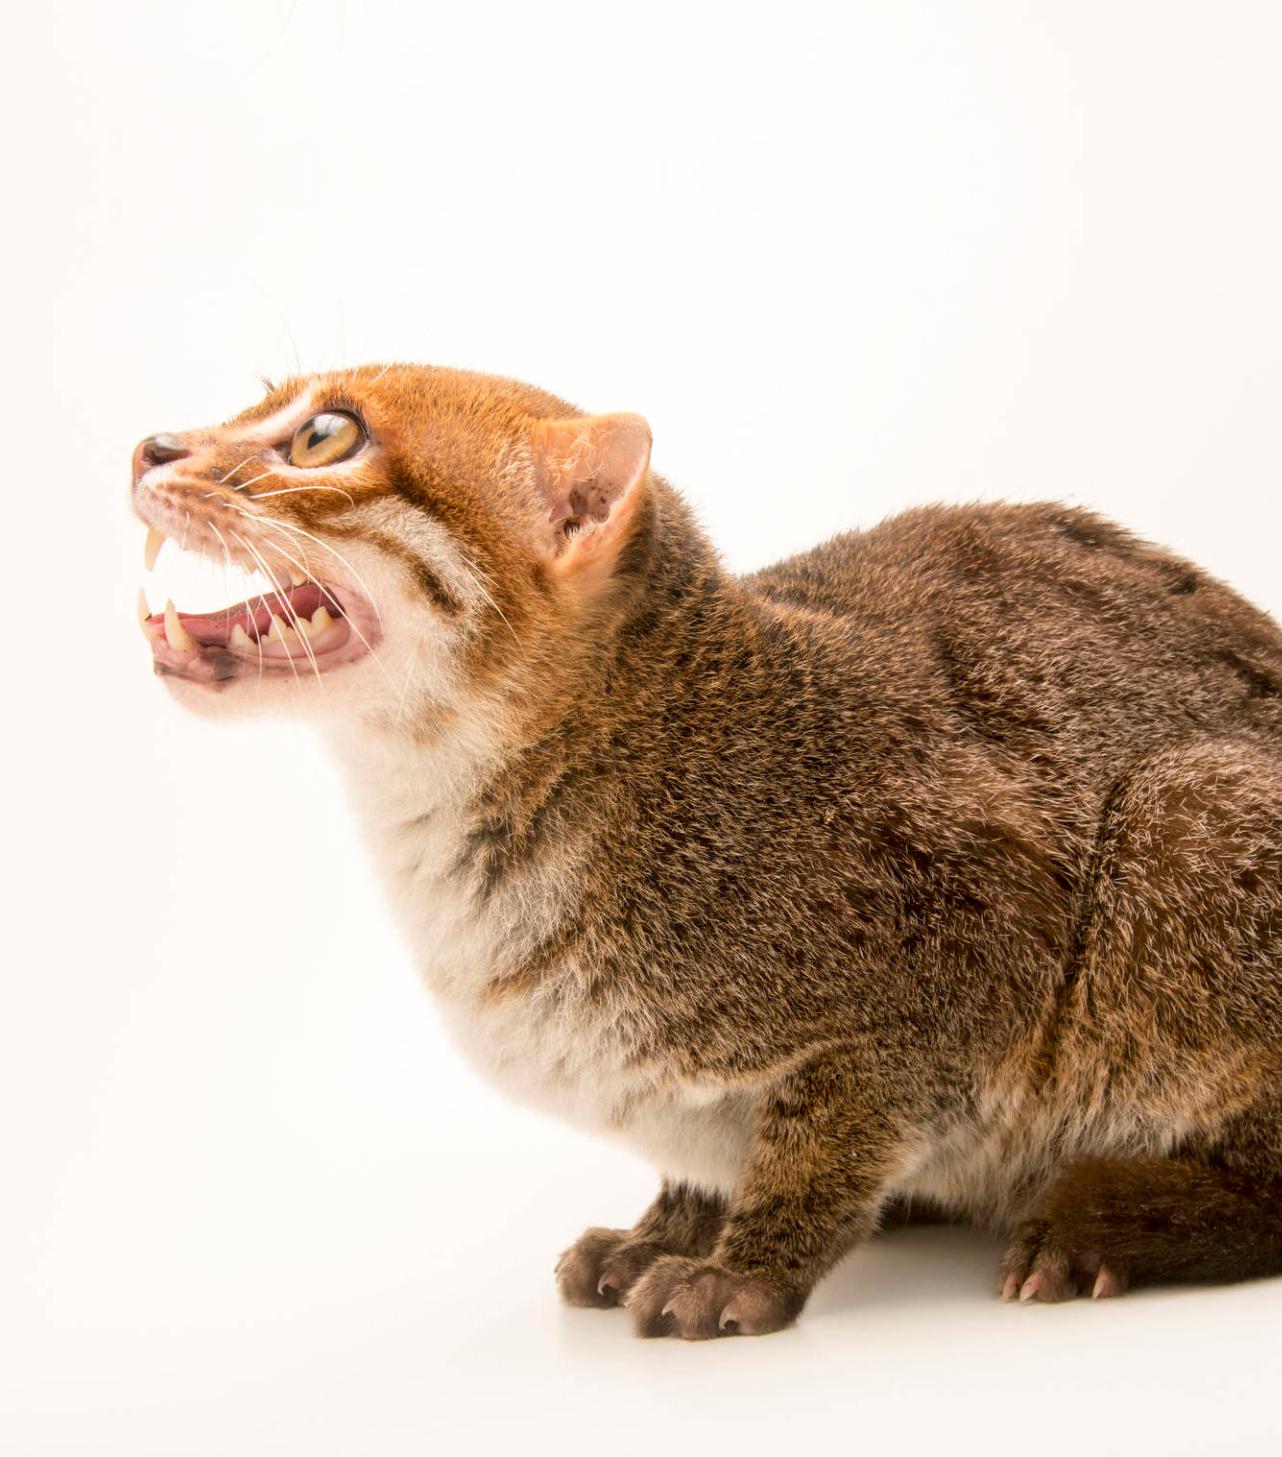 An endangered flatheaded cat (Prionailurus planiceps) at